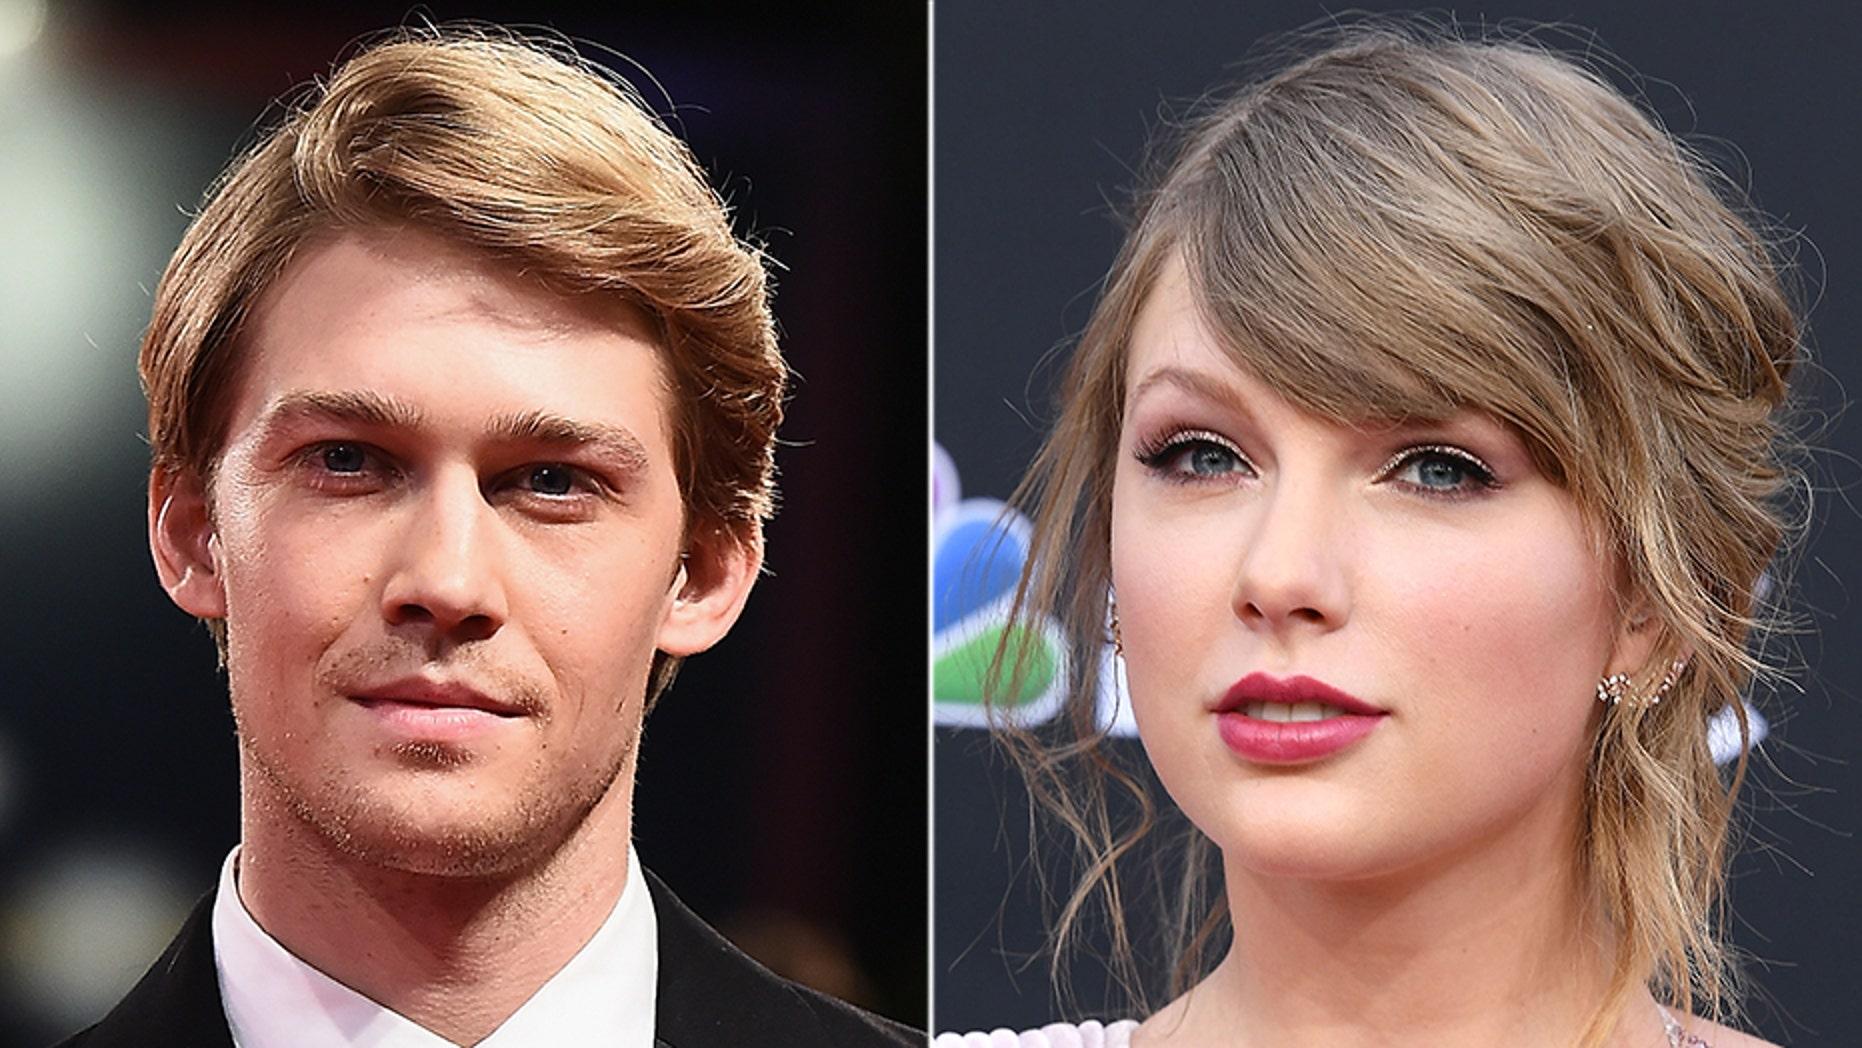 Taylor Swift gave boyfriend Joe Alwyn a rare shout-out on social media on Thursday.